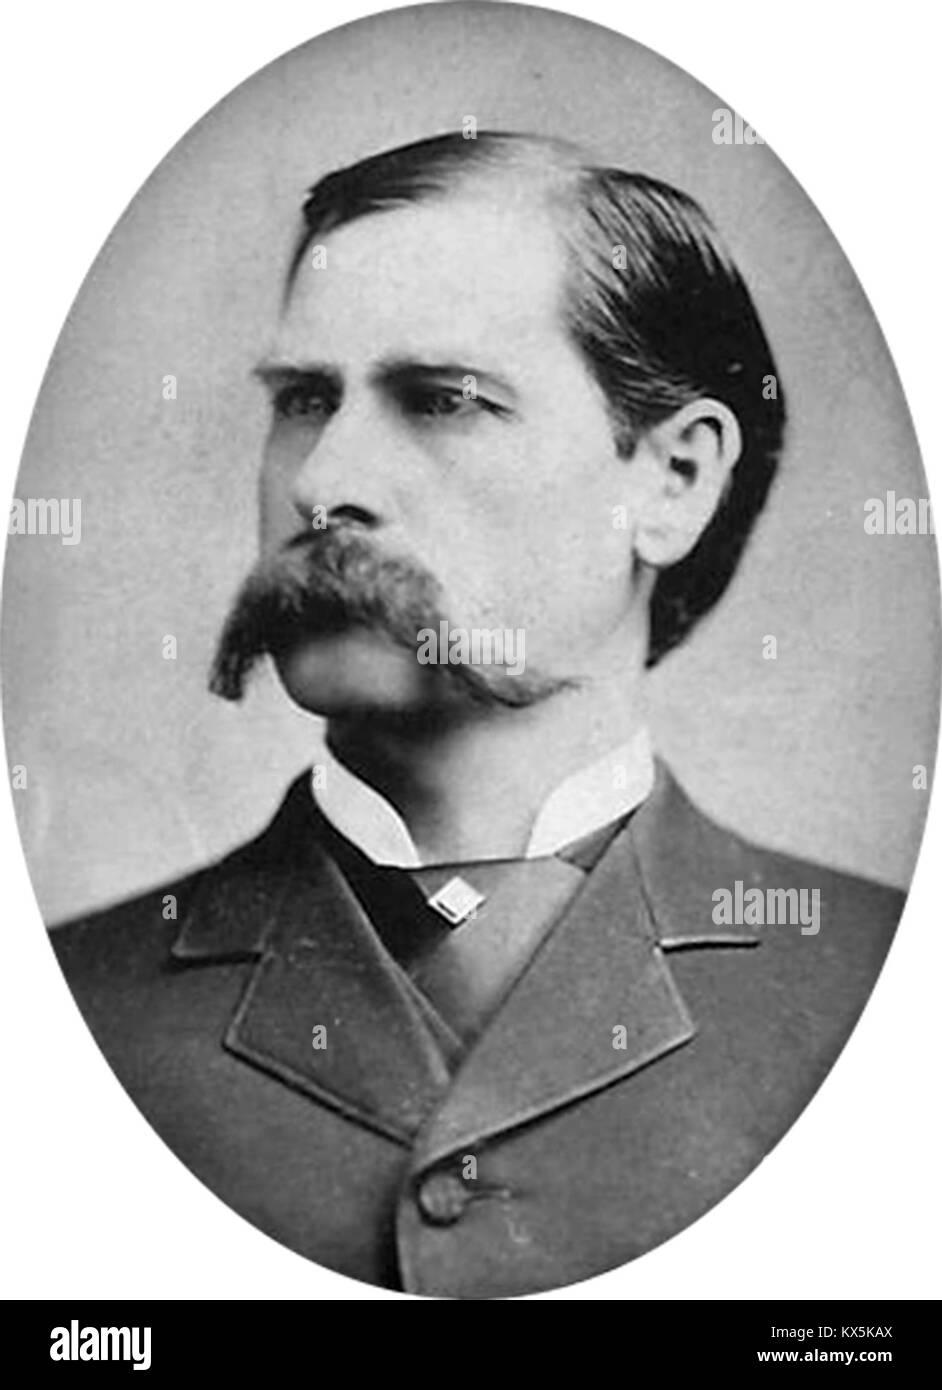 Wyatt Earp, Wyatt Earp, amerikanischer Berry Stapp Old West Deputy Sheriff in der Pima County und stellvertretende Stockbild